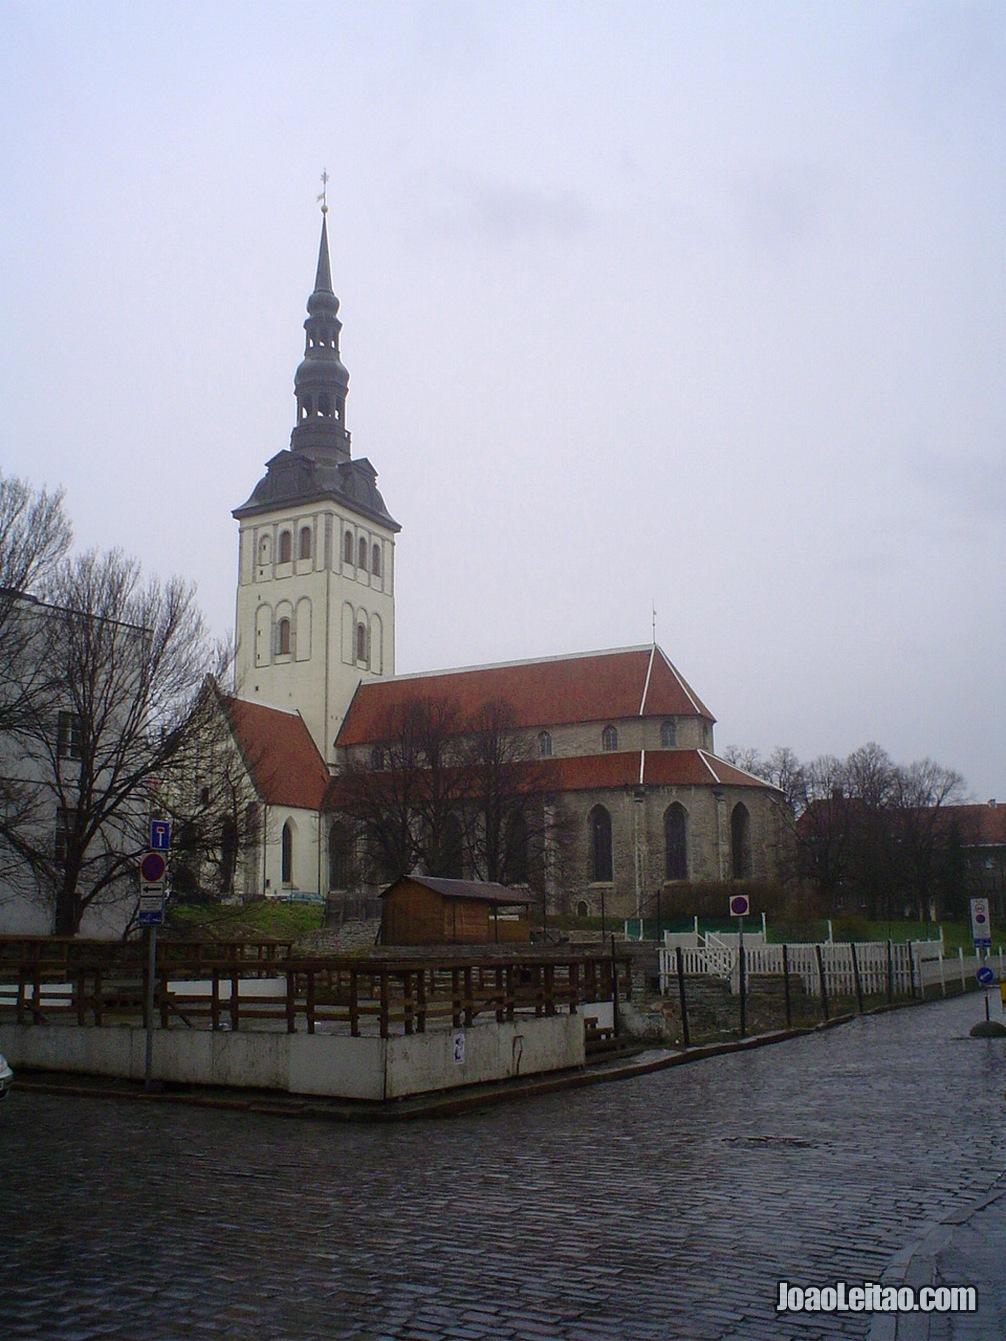 Fotografia de Tallinn, capital da Estónia